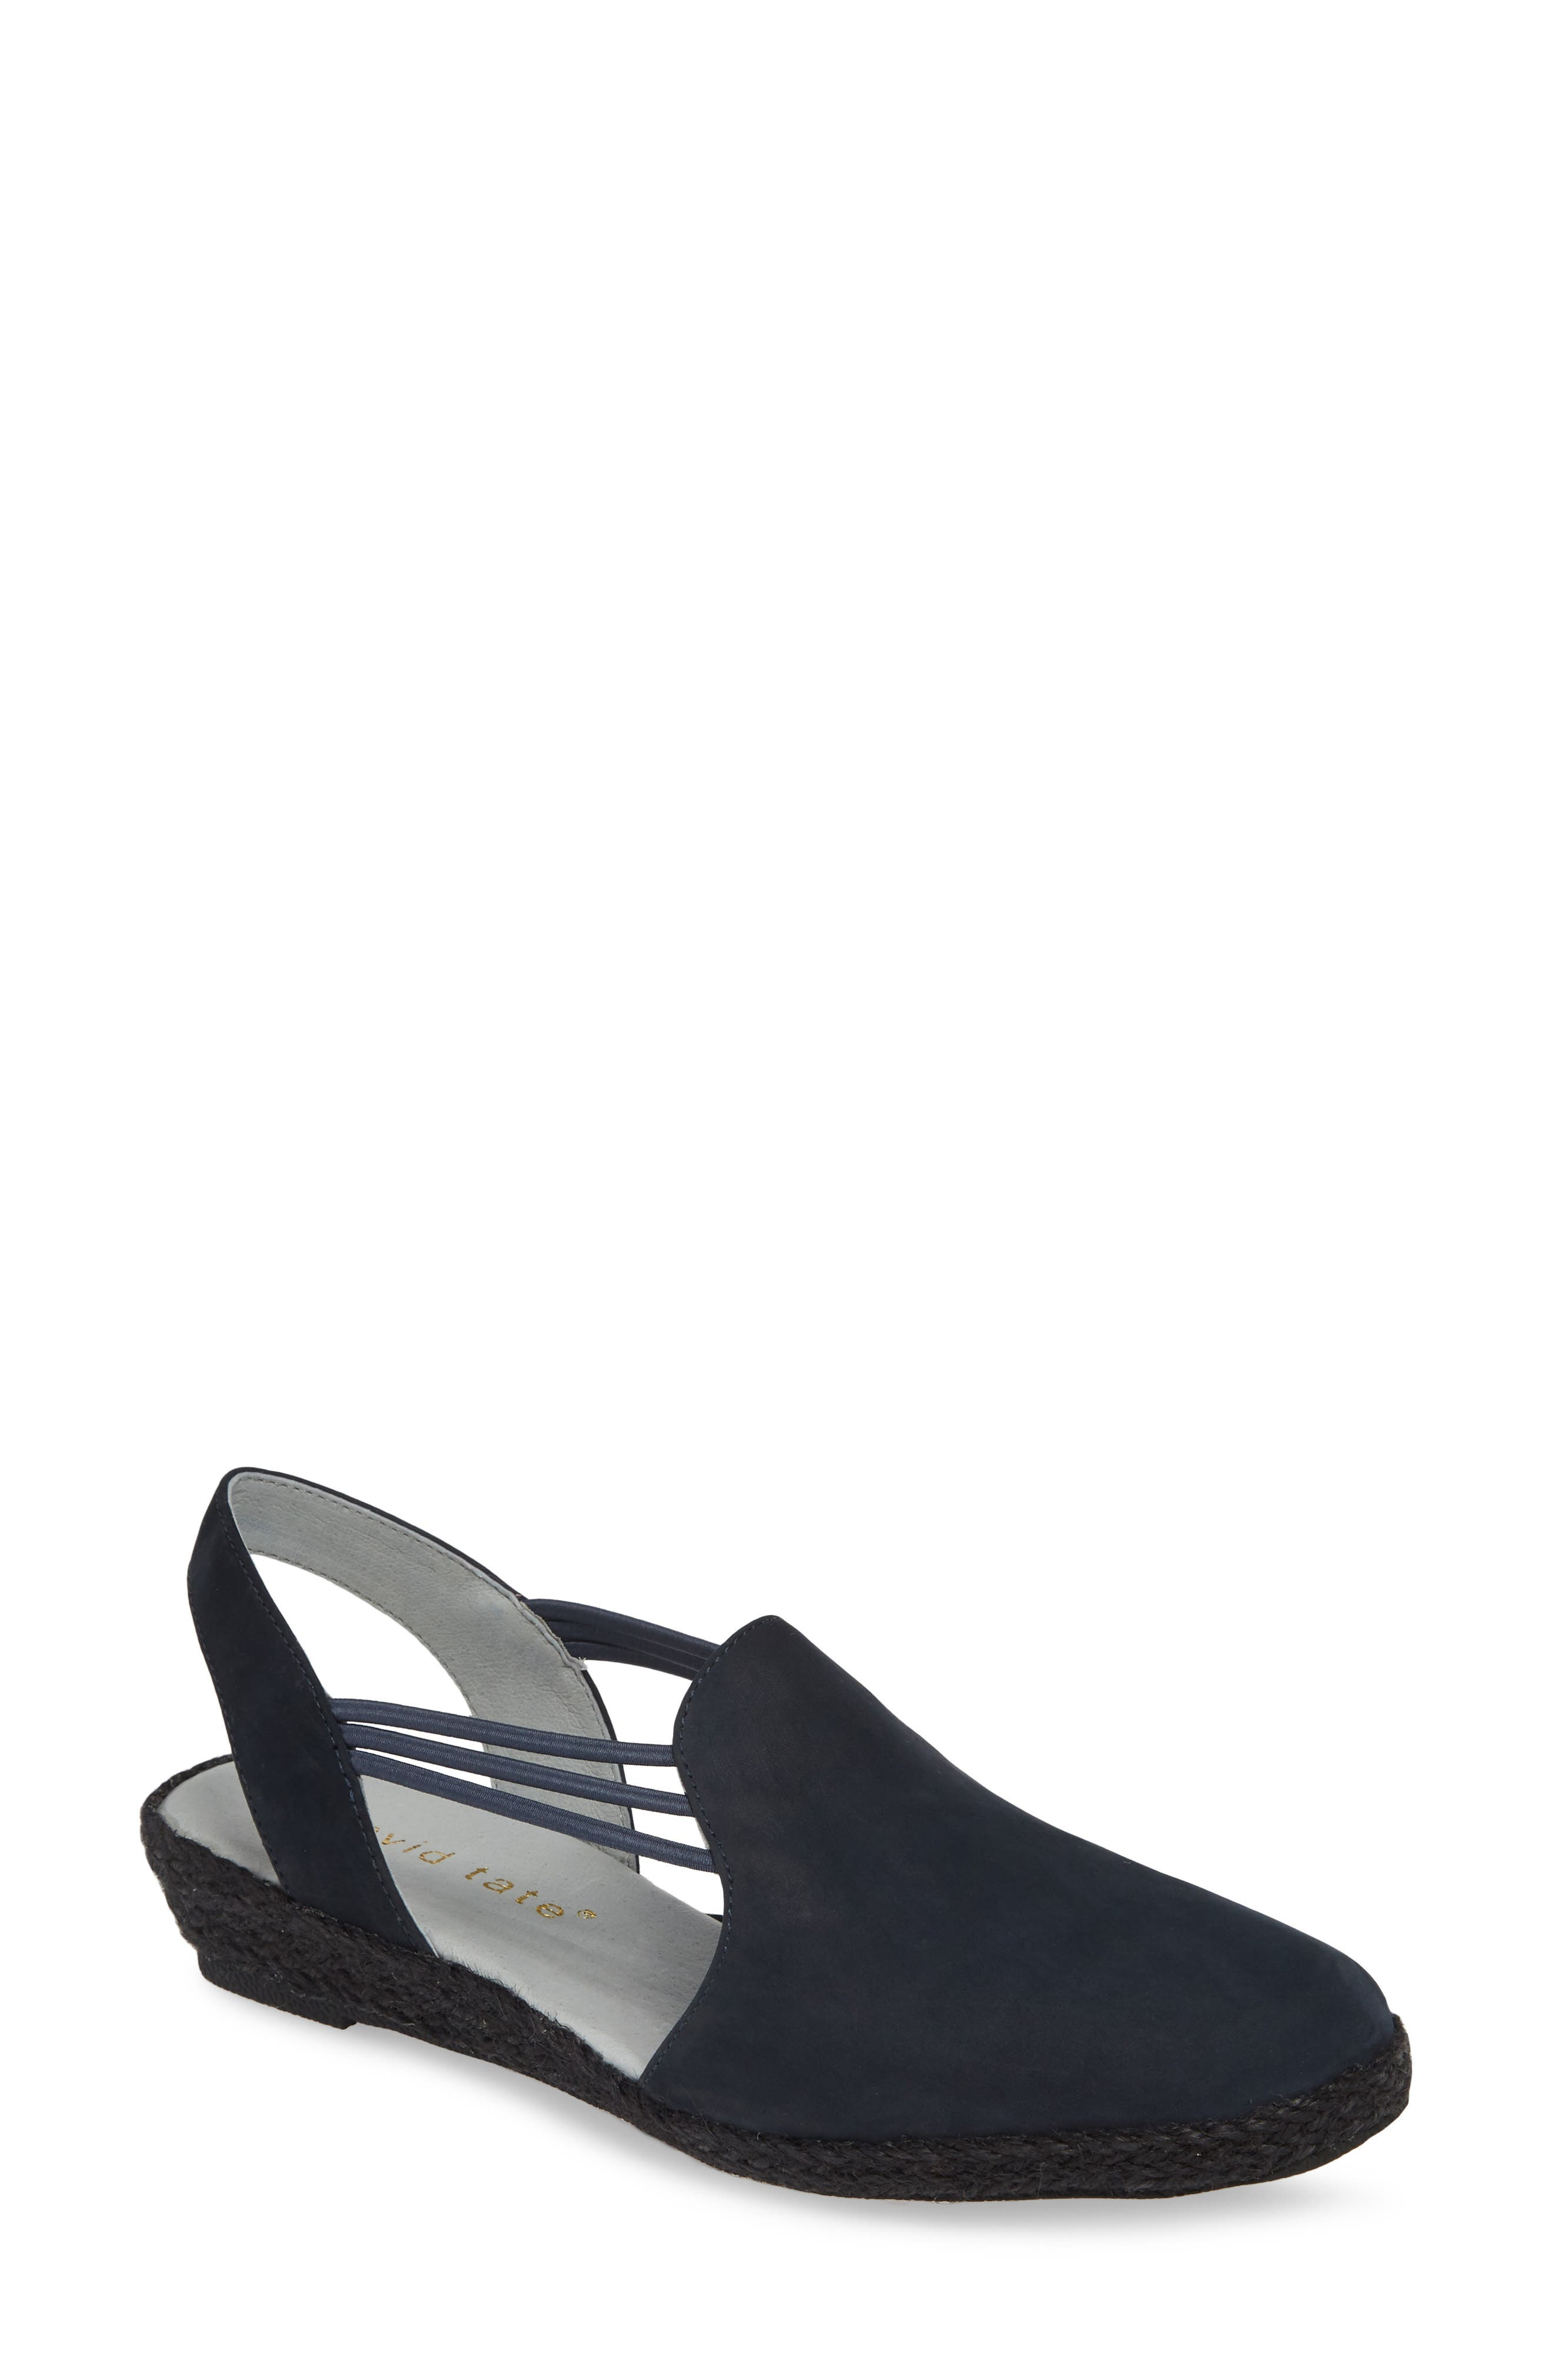 DAVID TATE 'Nelly' Slingback Wedge Sandal, Main, color, NAVY NUBUCK LEATHER